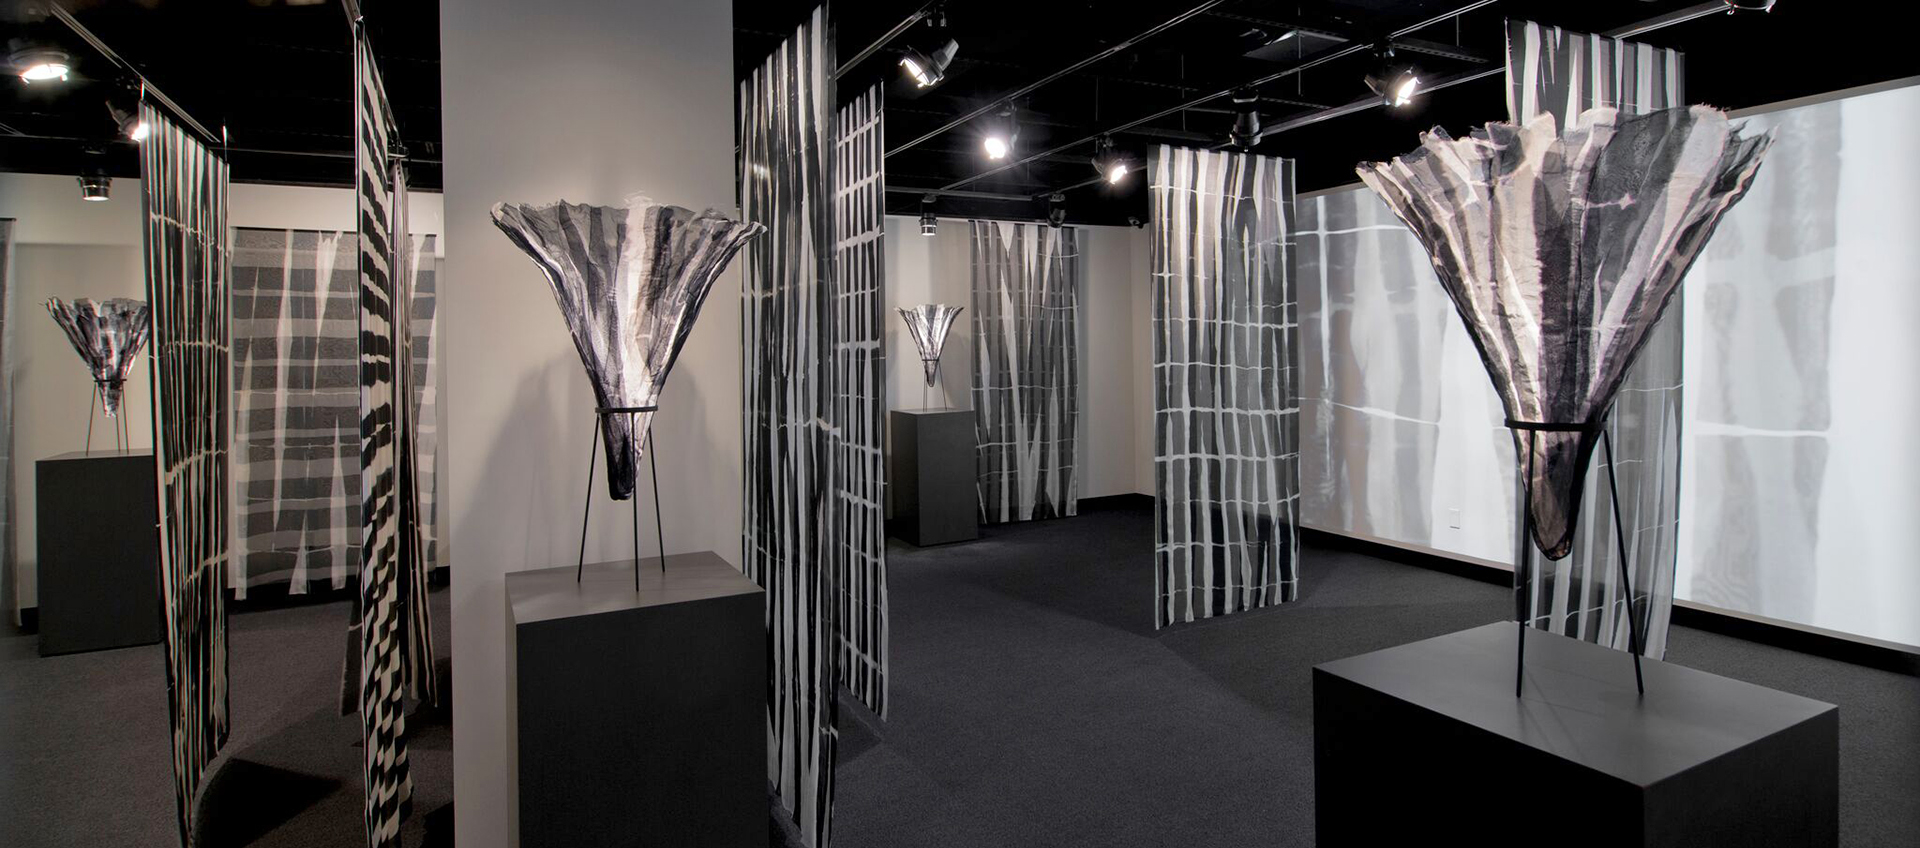 the robert hillestad textiles gallery